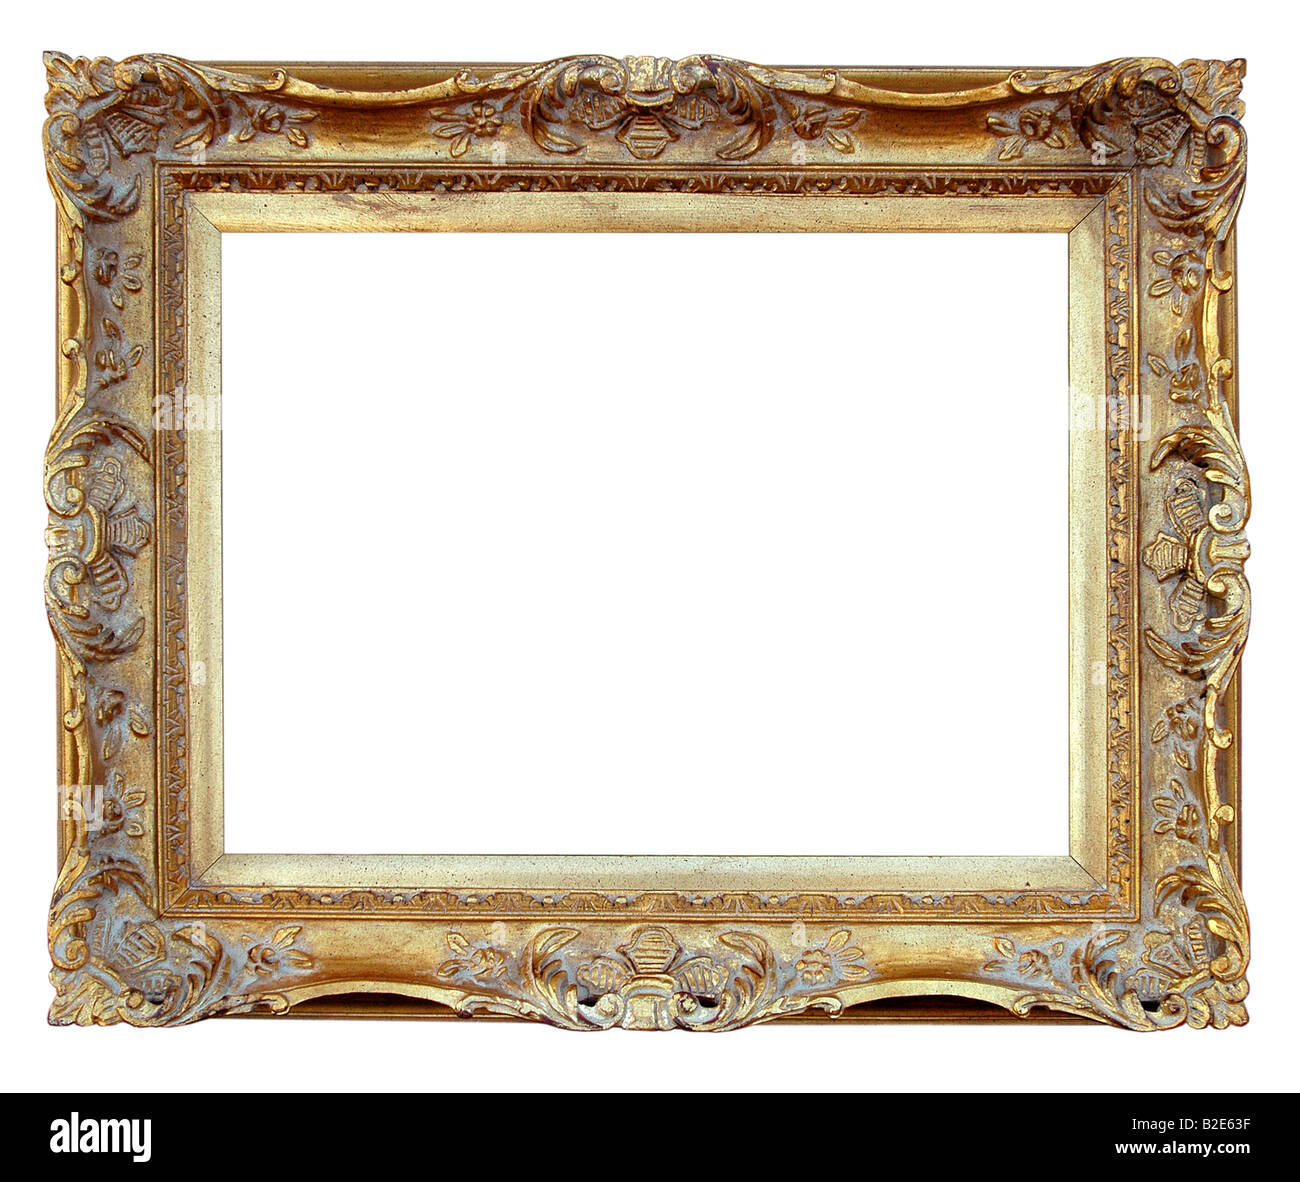 Vintage Frame over white background - Stock Image